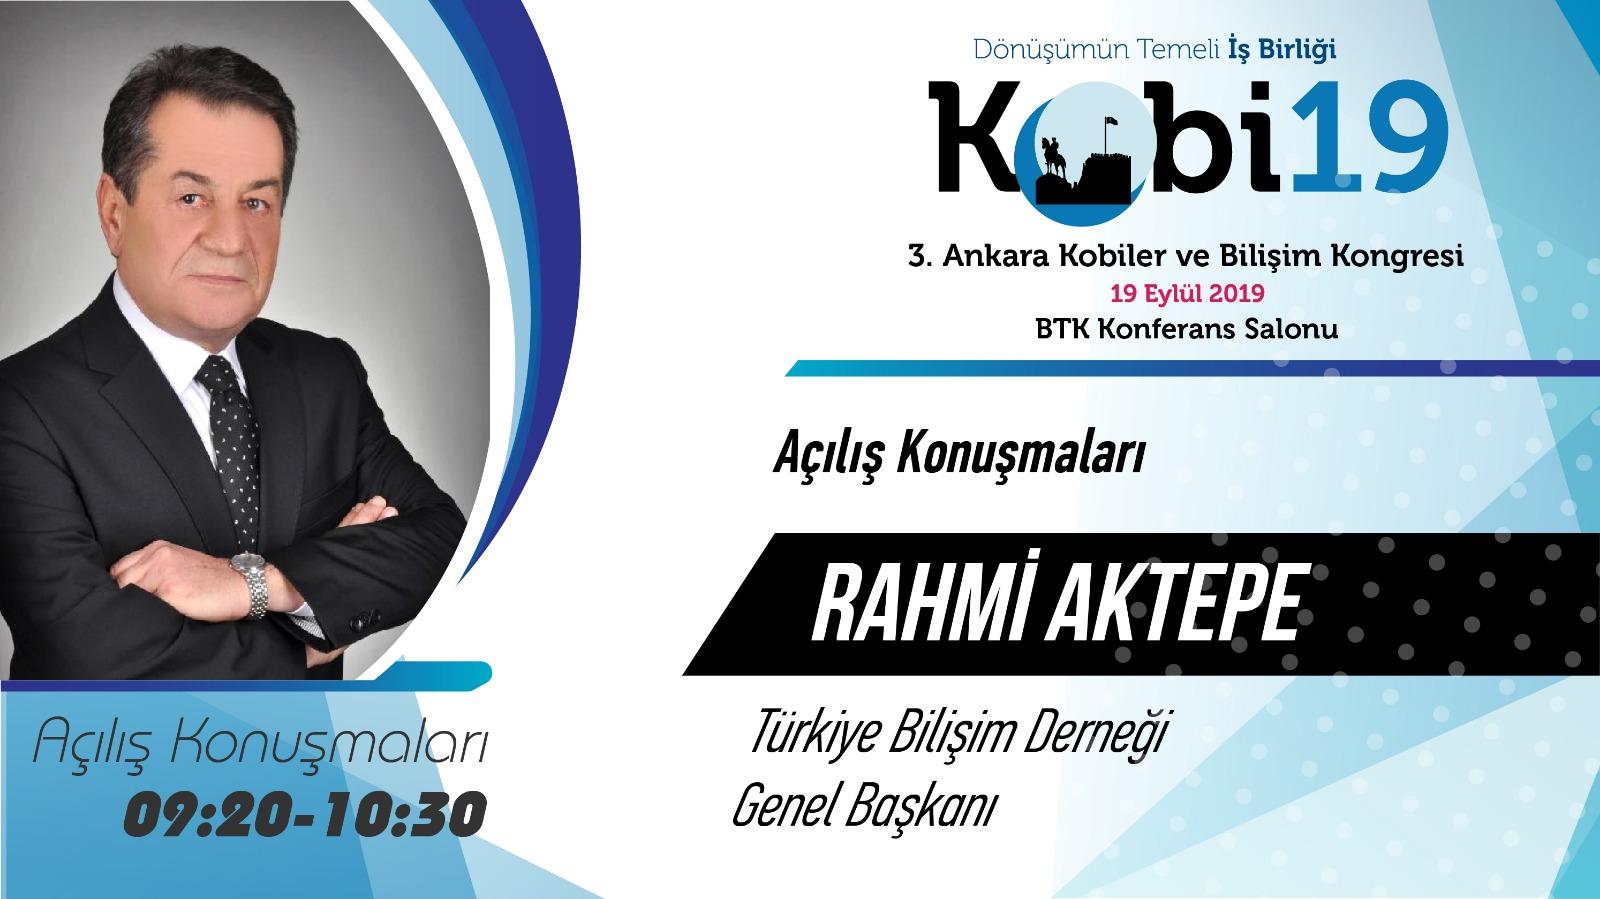 Rahmi AKTEPE - 3. Ankara Kobiler ve Bilişim Kongresi 2019